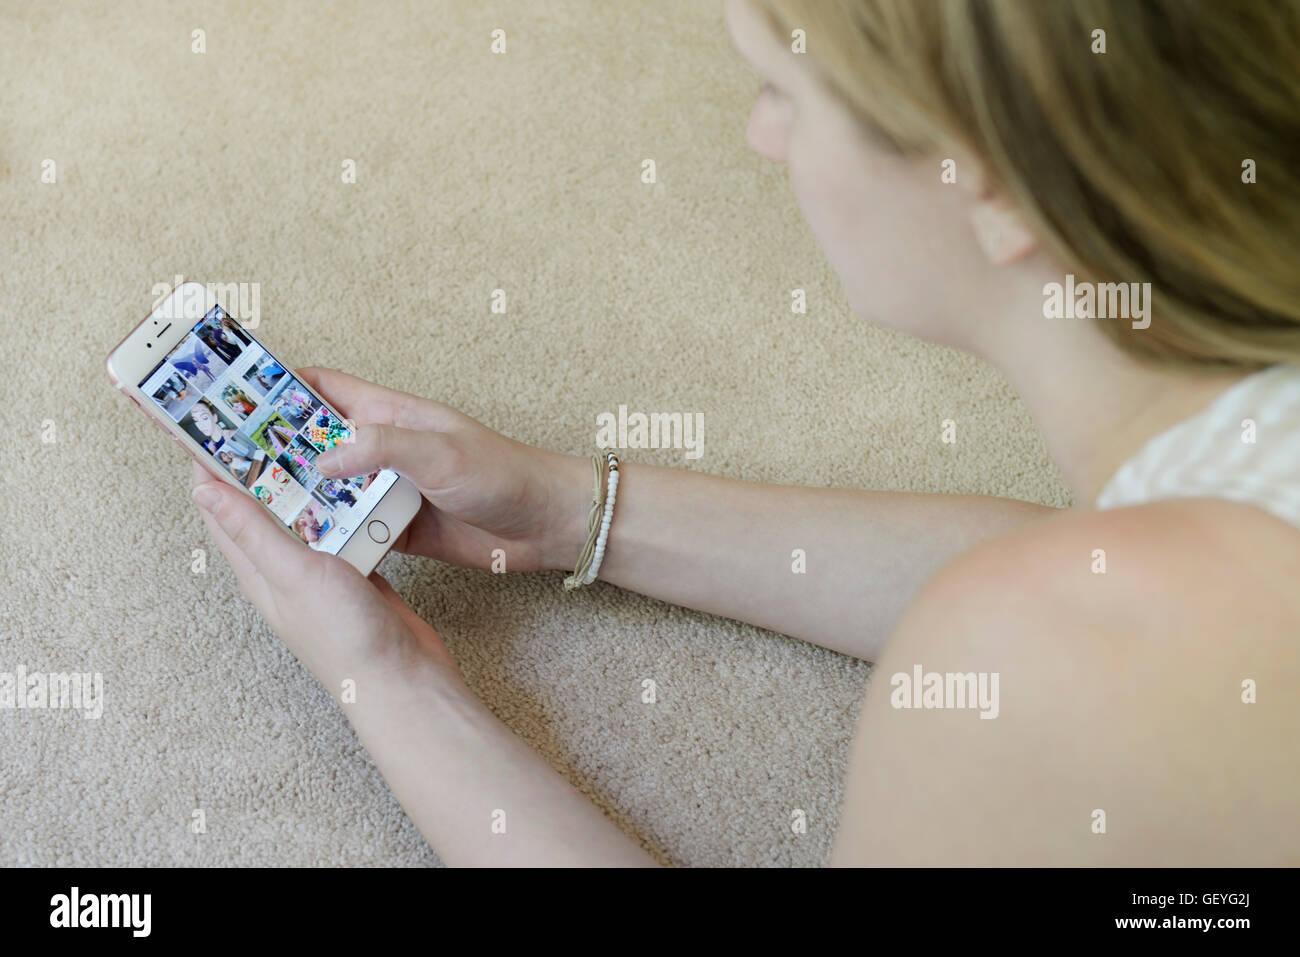 Teenage girl using Instagram social media app on her mobile phone (iphone) - Stock Image